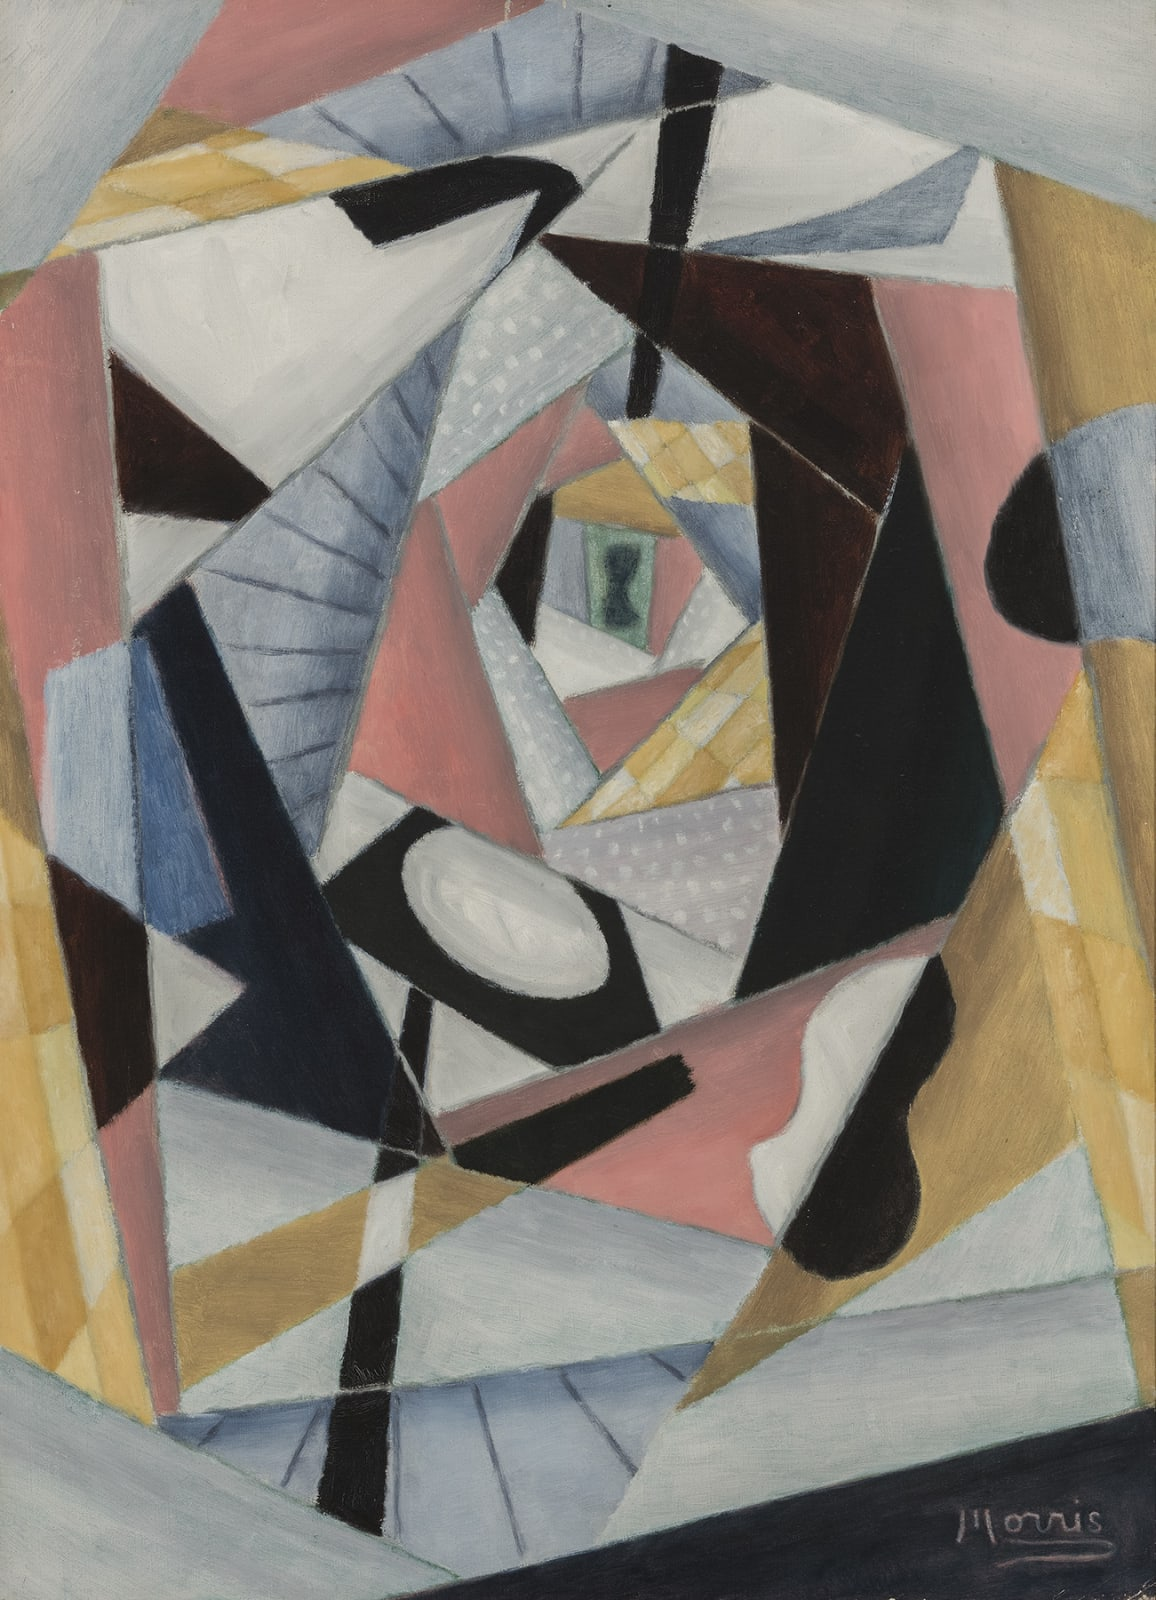 George L. K. Morris, Labyrinth No. 1, 1955-56